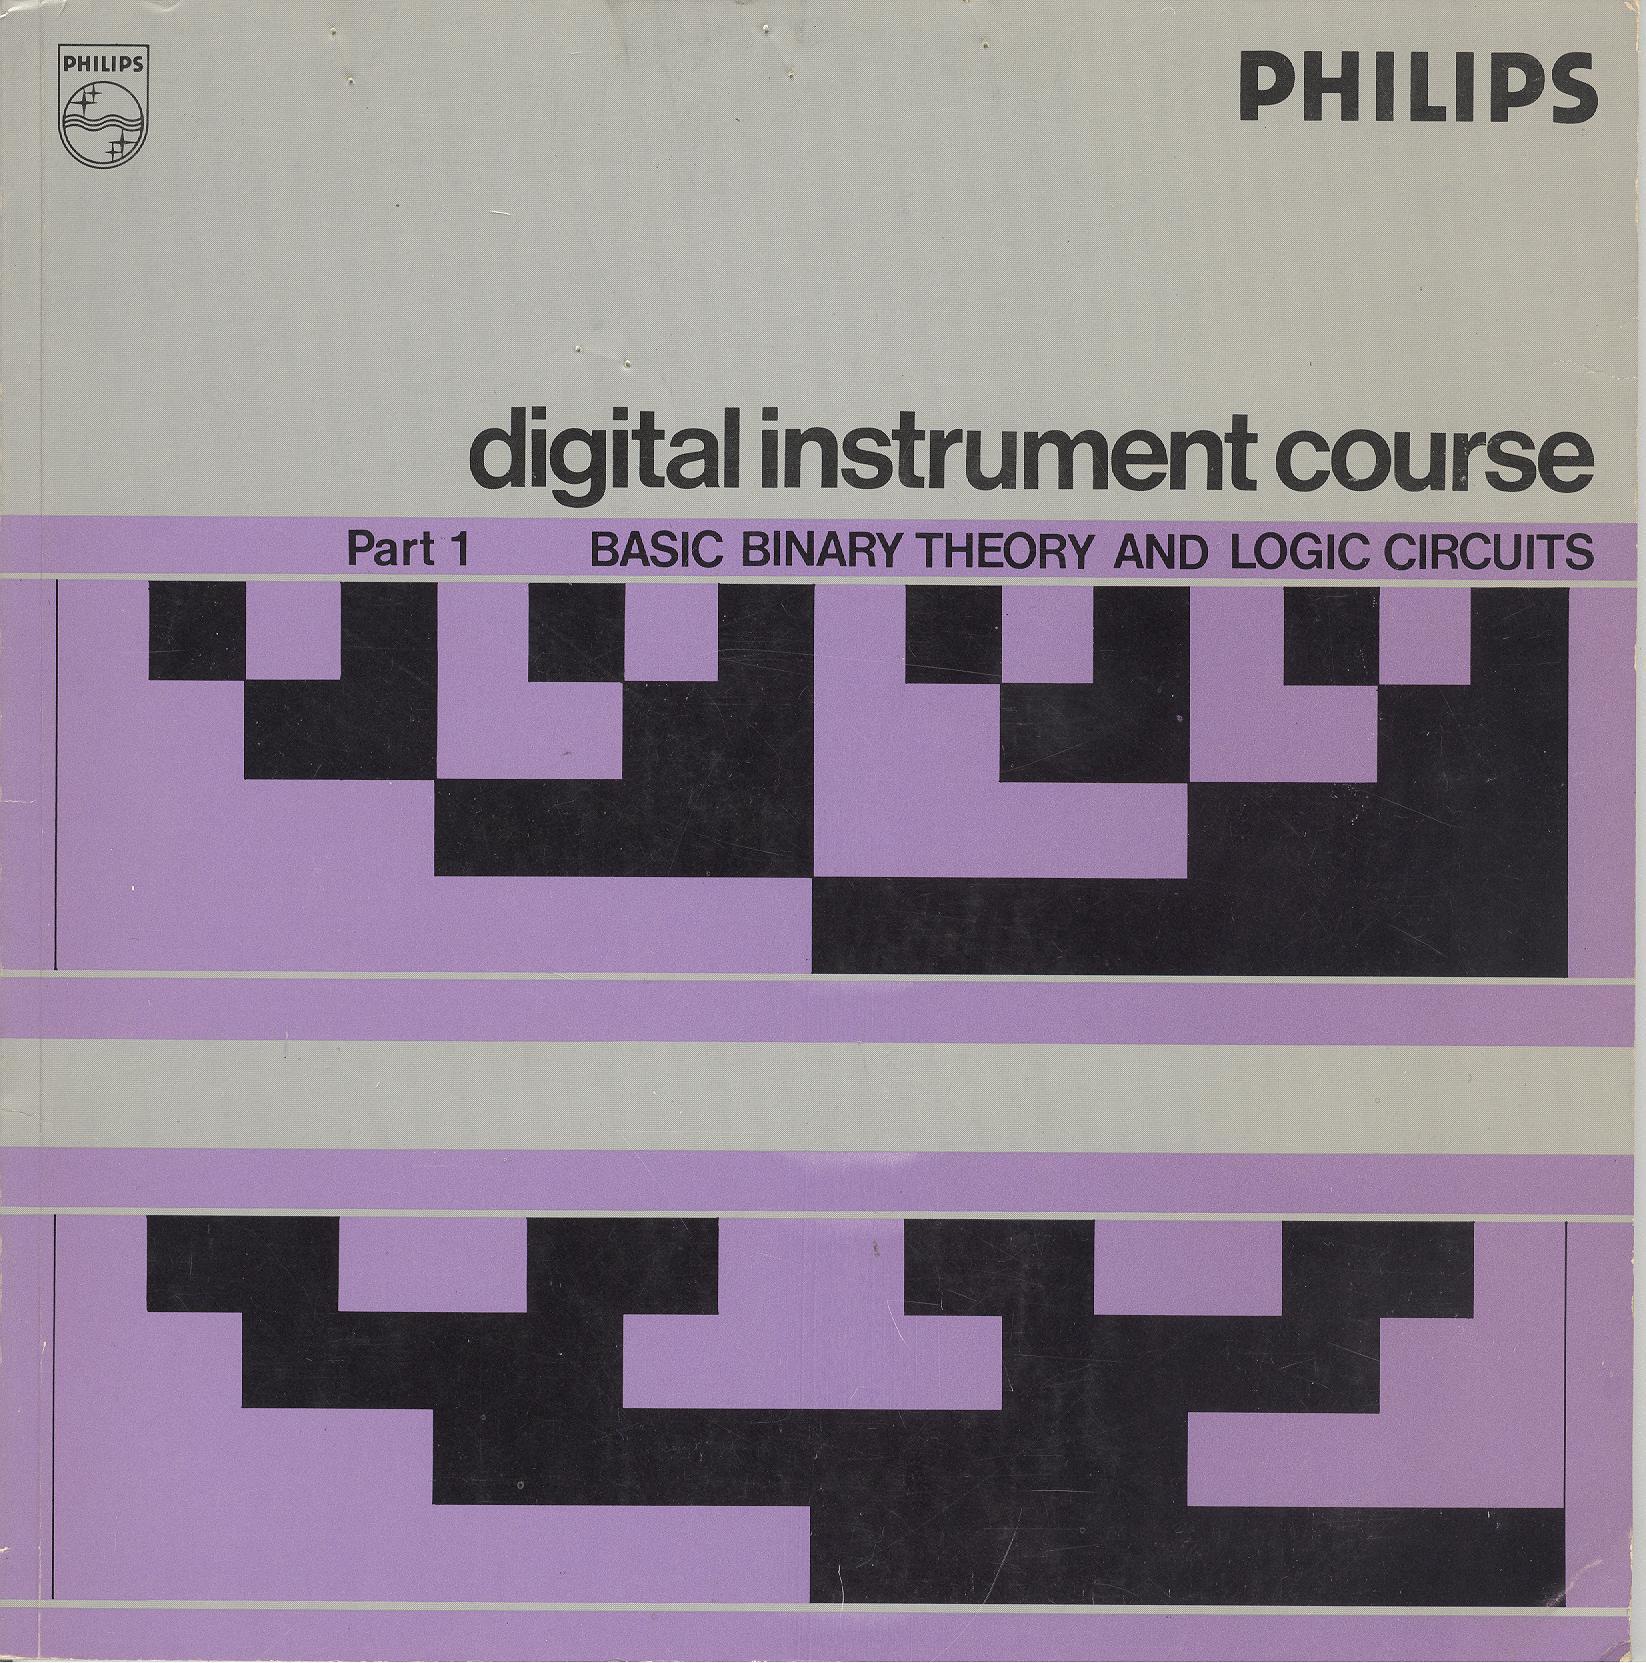 Digital Instrument Course